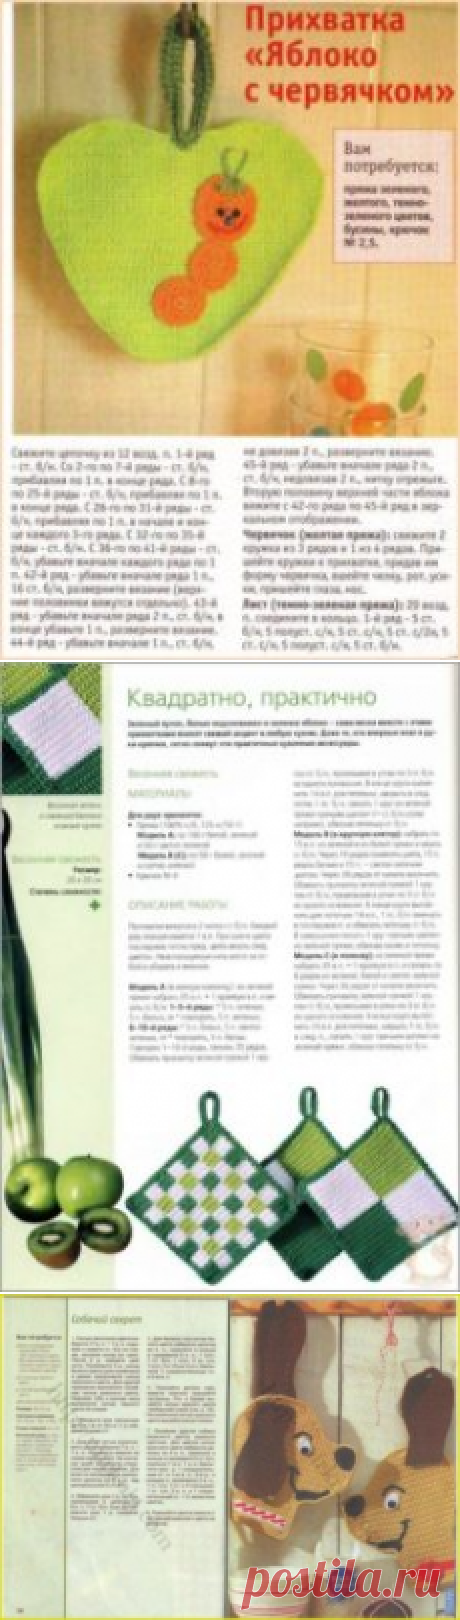 Прихватки крючком   metelica-online.ru